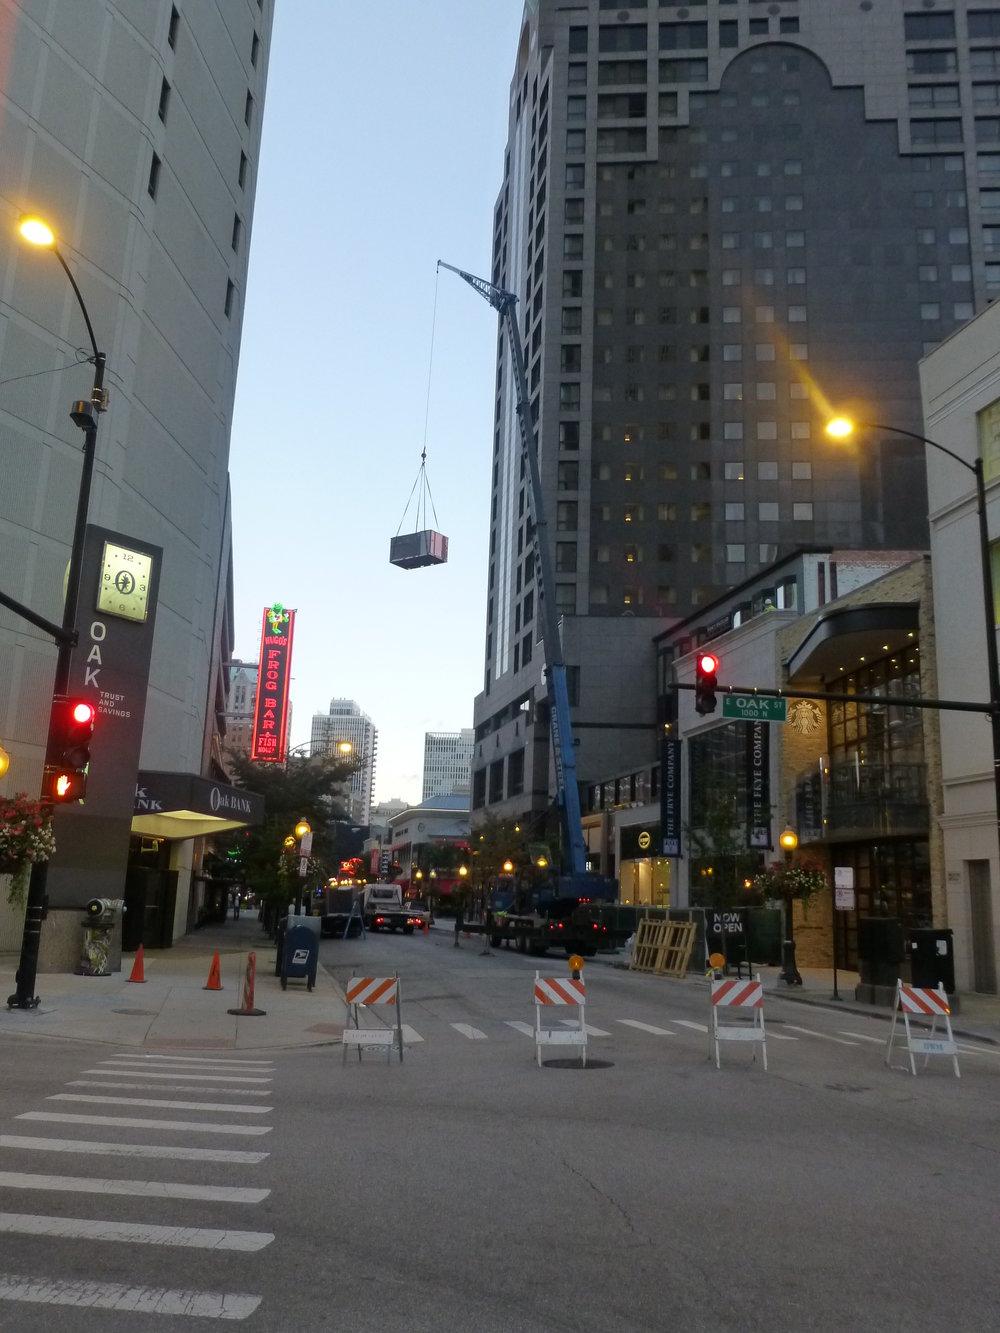 Frye Shoe Company, Chicago, IL